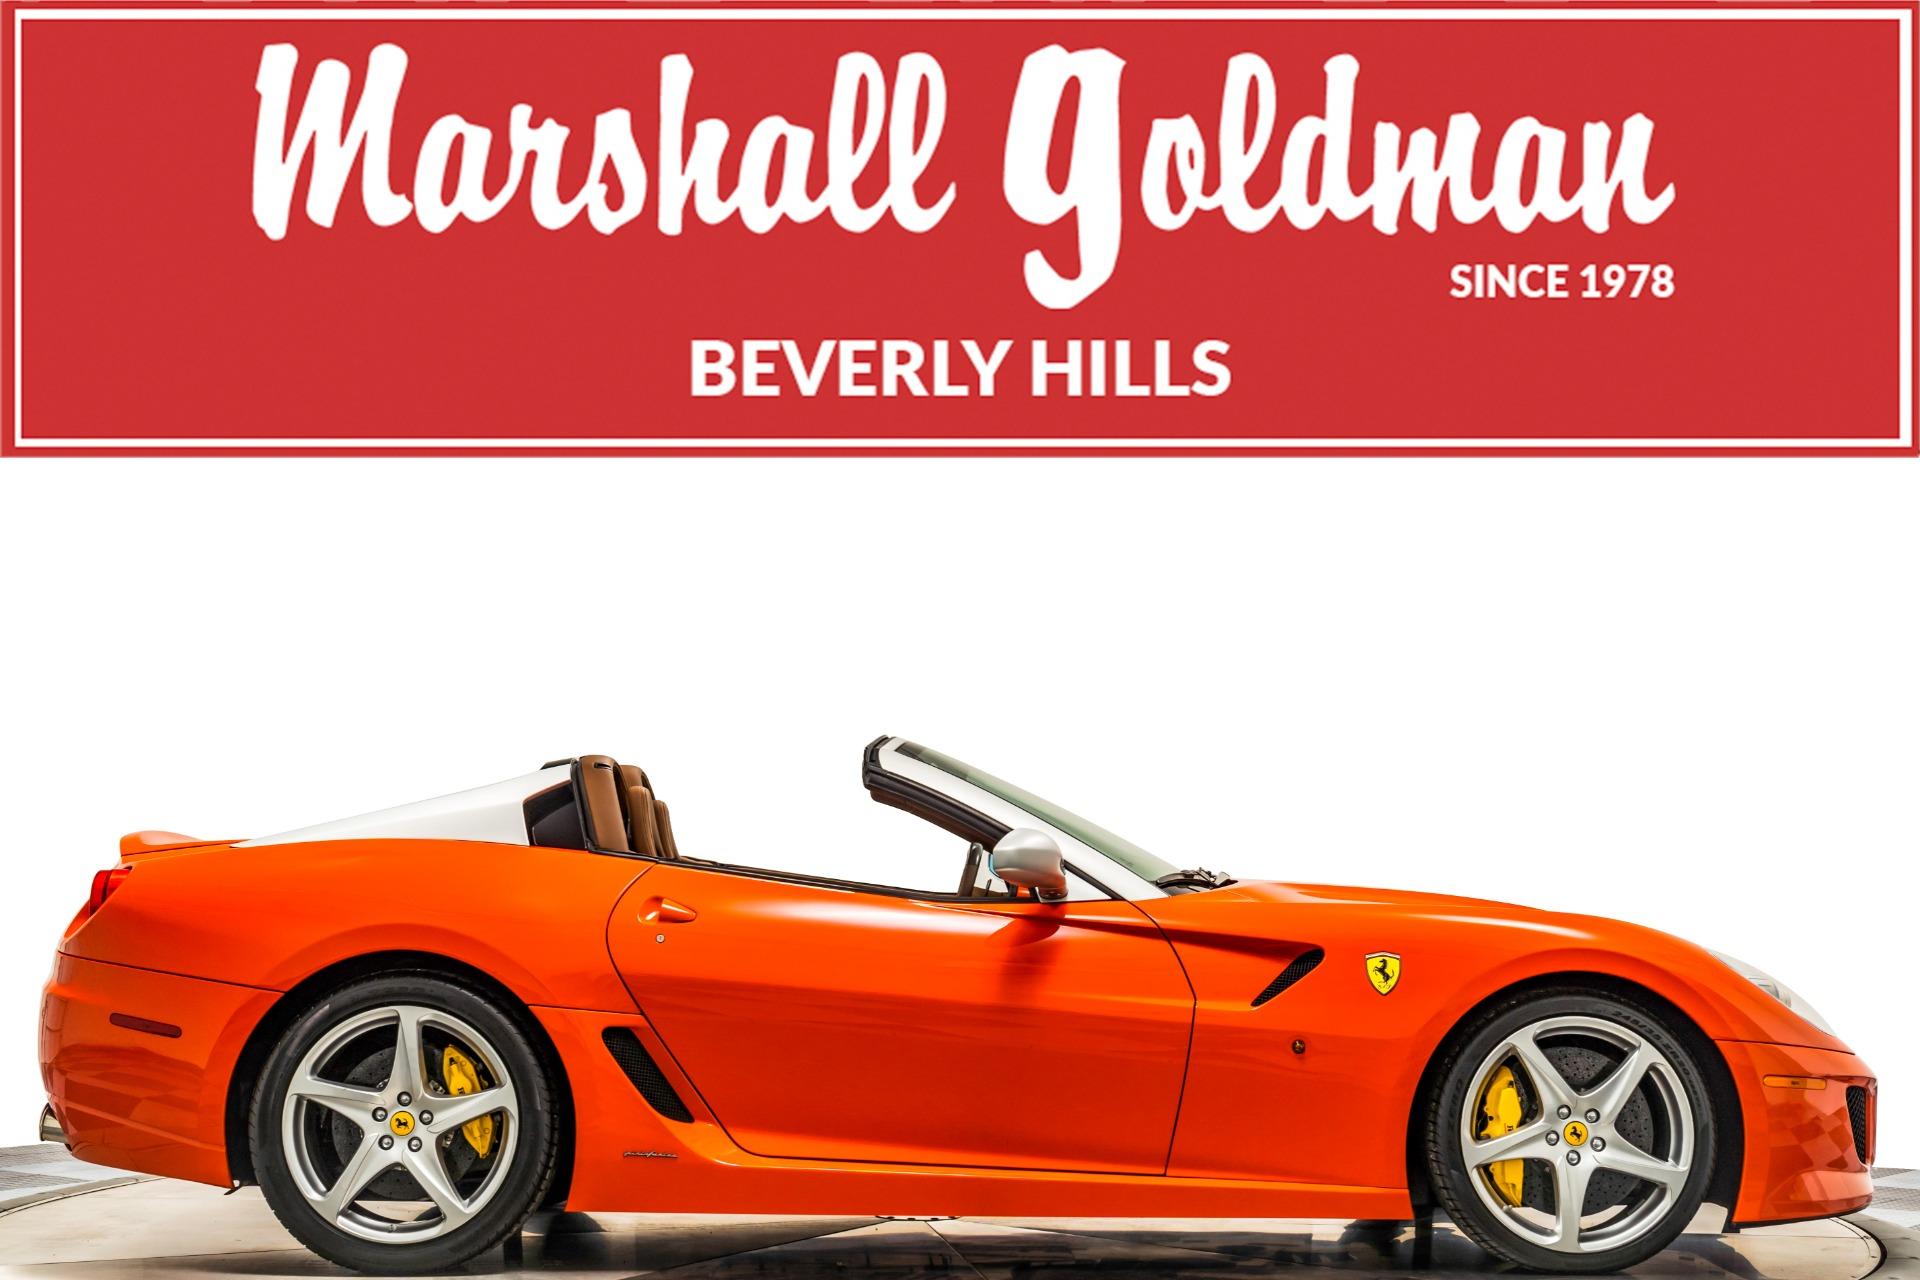 Used 2011 Ferrari 599 Sa Aperta For Sale 1 385 900 Marshall Goldman Cleveland Stock B19899